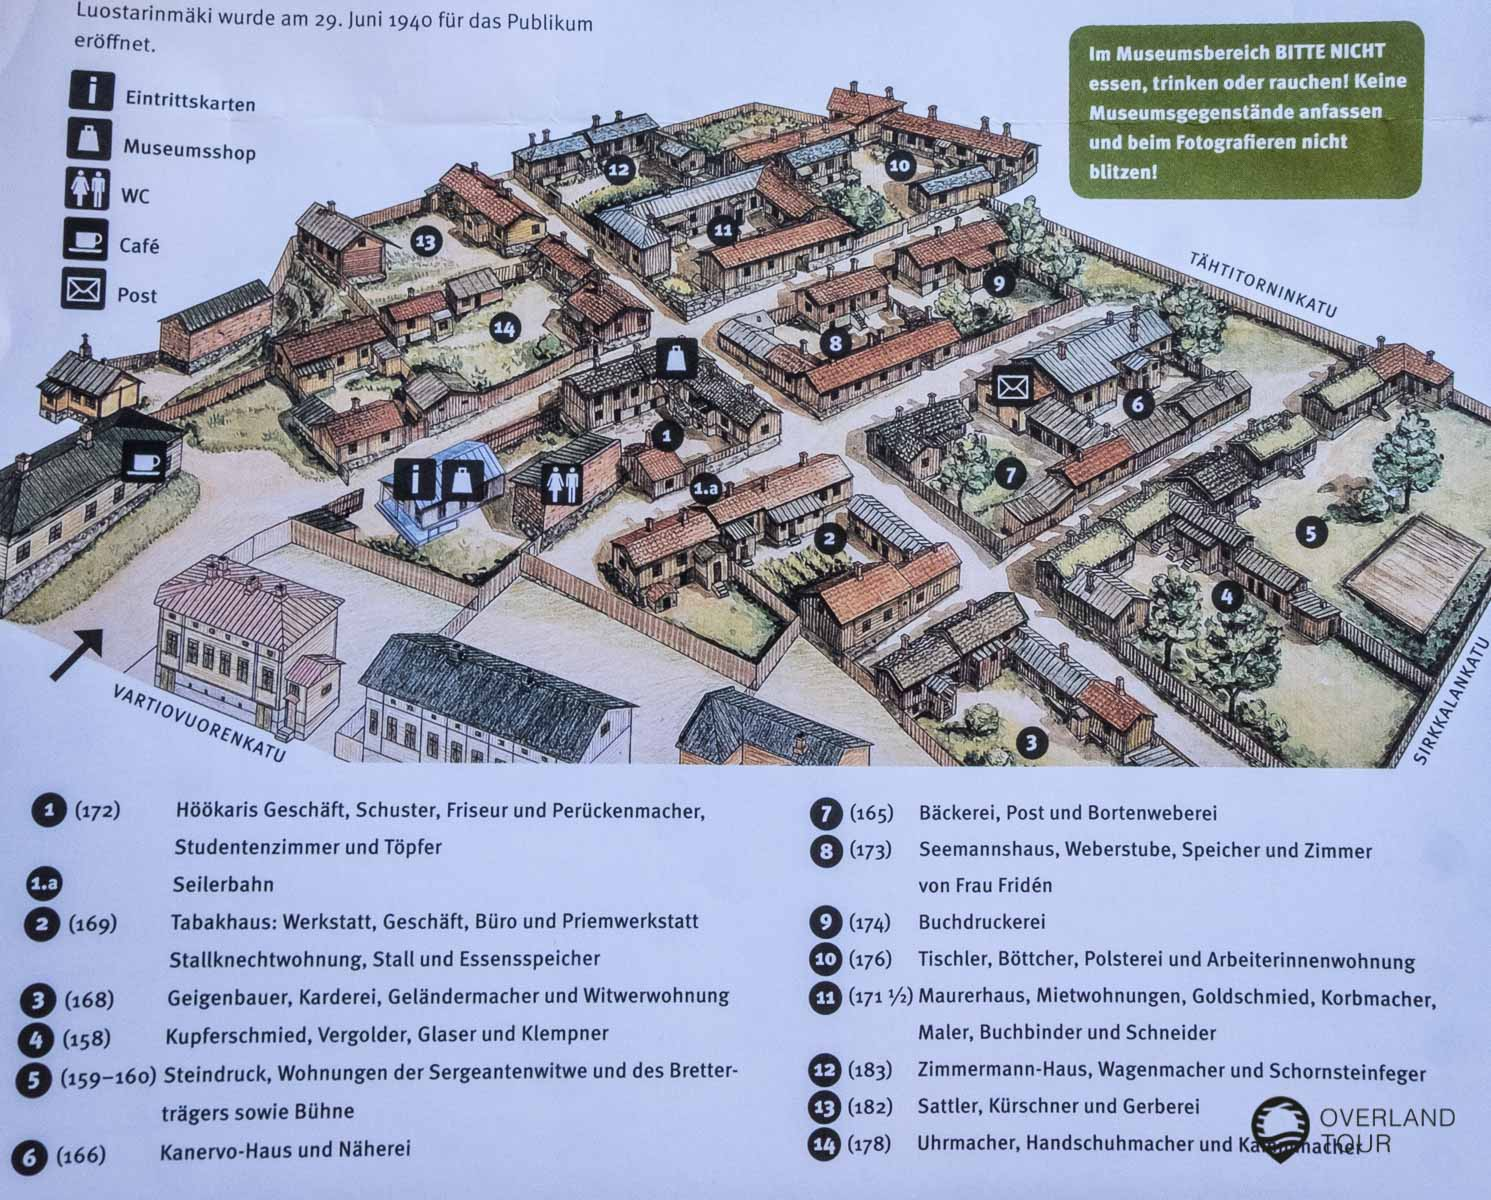 Das Freilichtmuseum Luostarinmäki